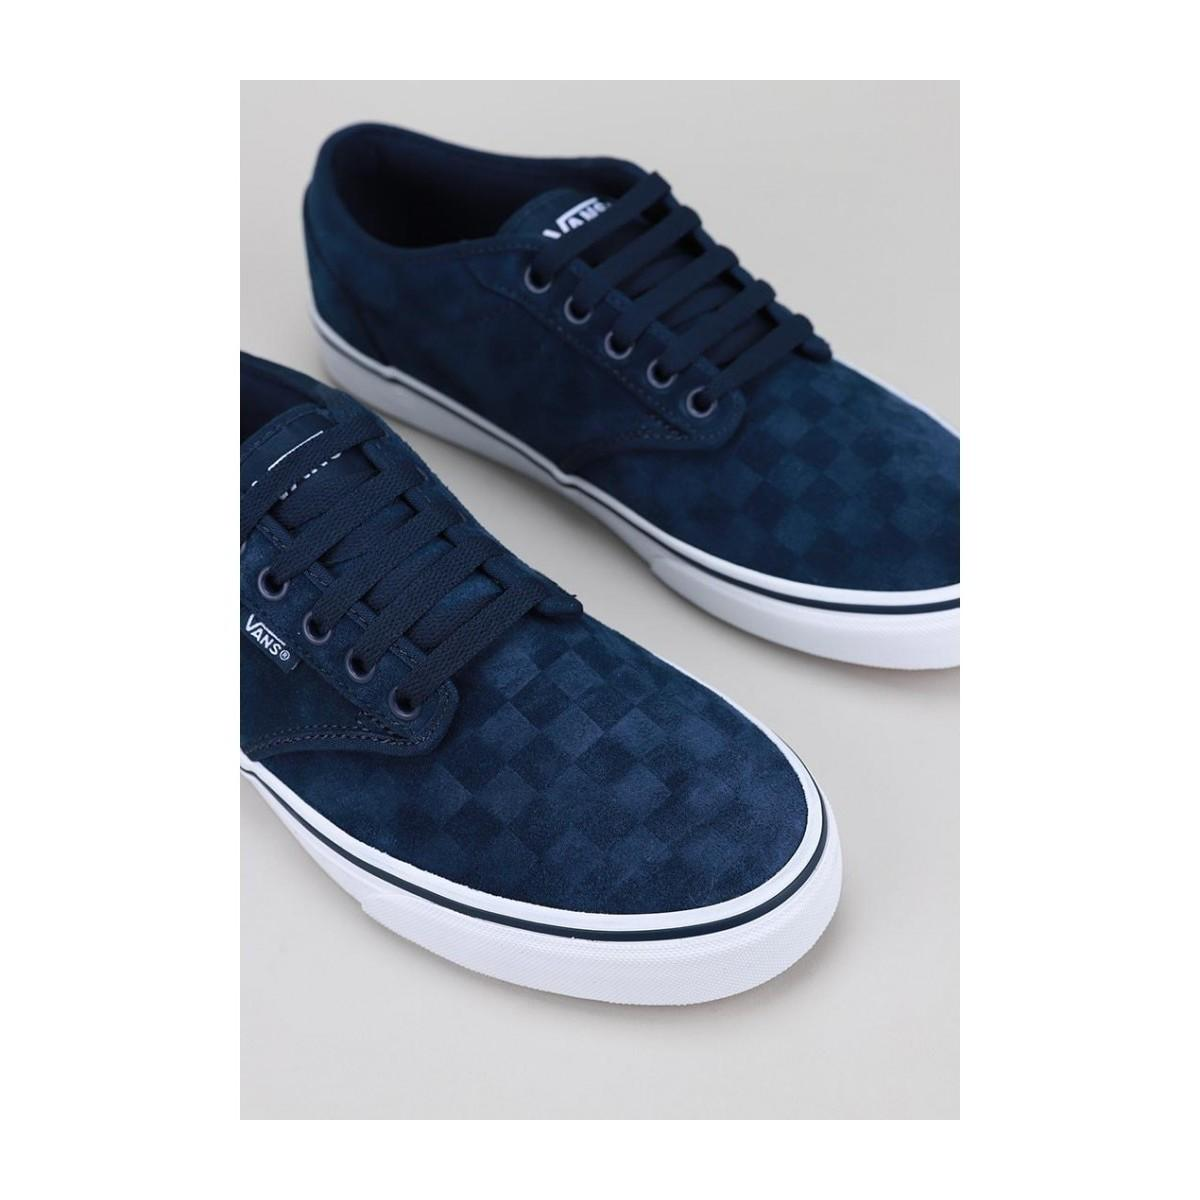 MN Atwood (SUEDE EMBOSS) DRS BL/WHT femmes Chaussures en bleu Vans ...